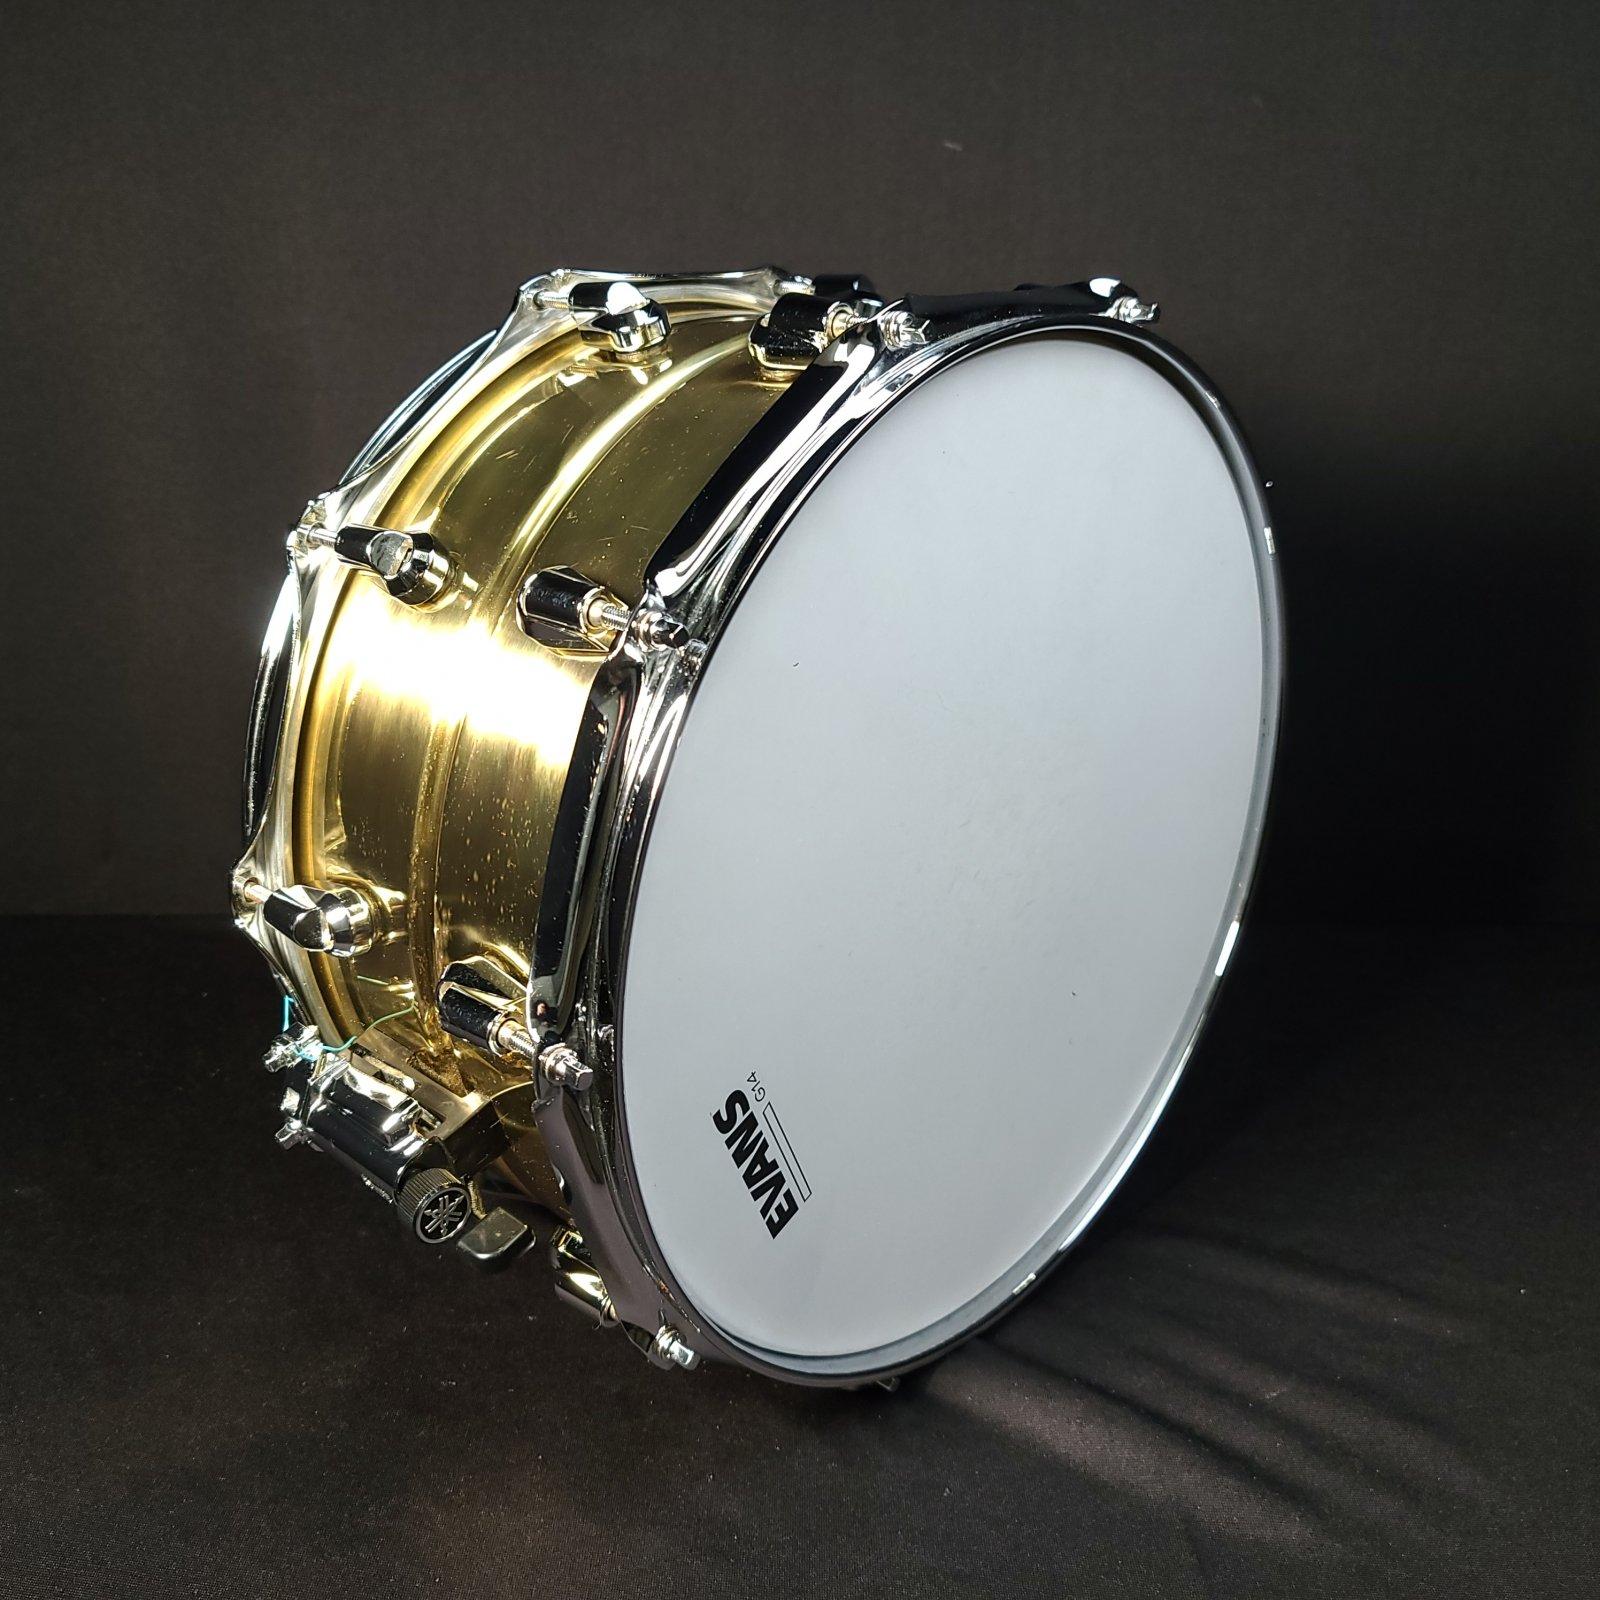 Used Yamaha Brass 7x14 Snare Nouveau Lugs